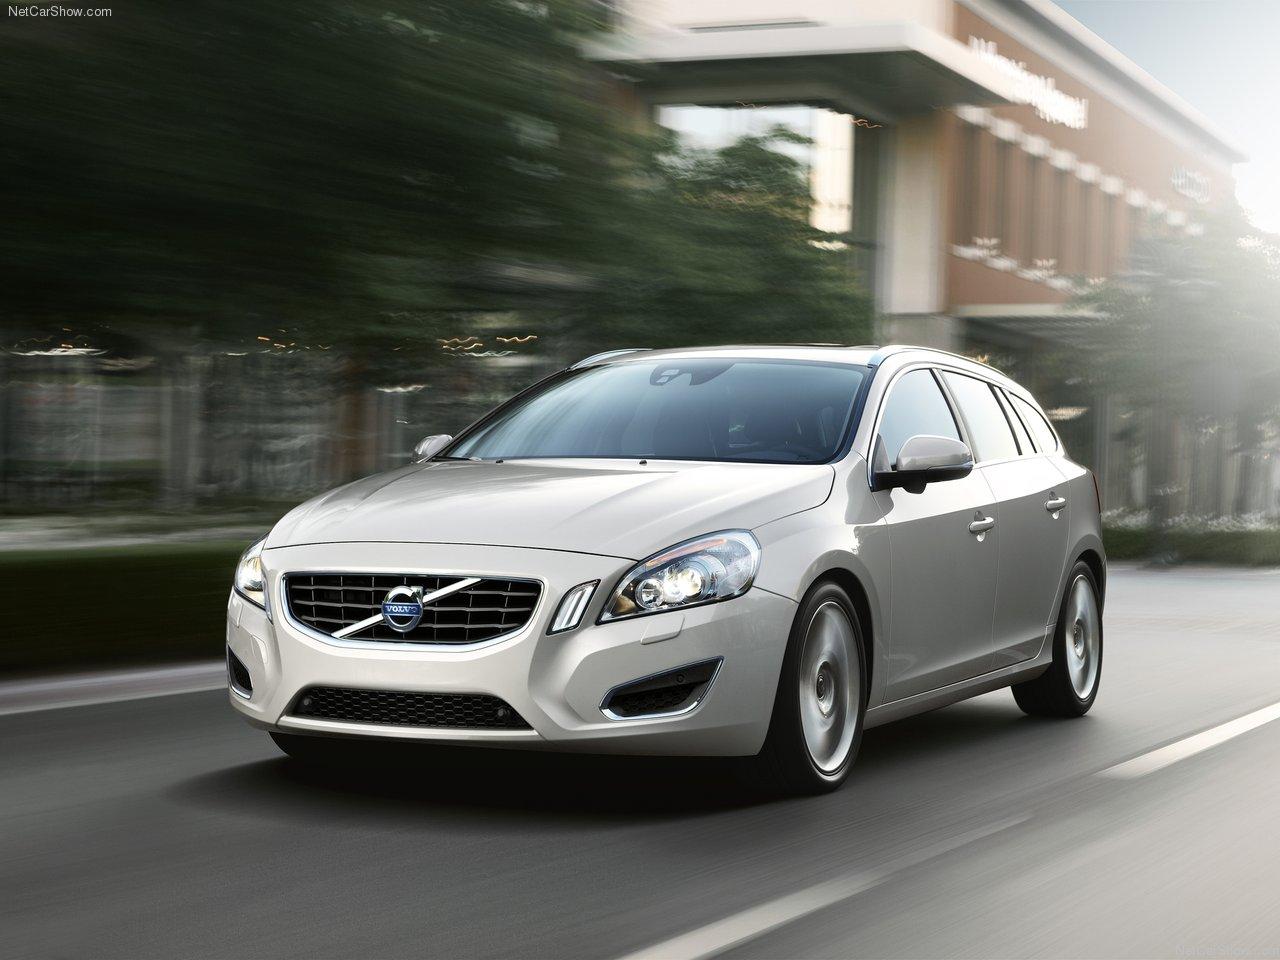 http://3.bp.blogspot.com/_WDRV2DMuP0Y/TTLiS-uj9-I/AAAAAAAABnM/ZJFsIF6BZjs/s1600/Volvo-V60_2011_1280x960_wallpaper_02.jpg